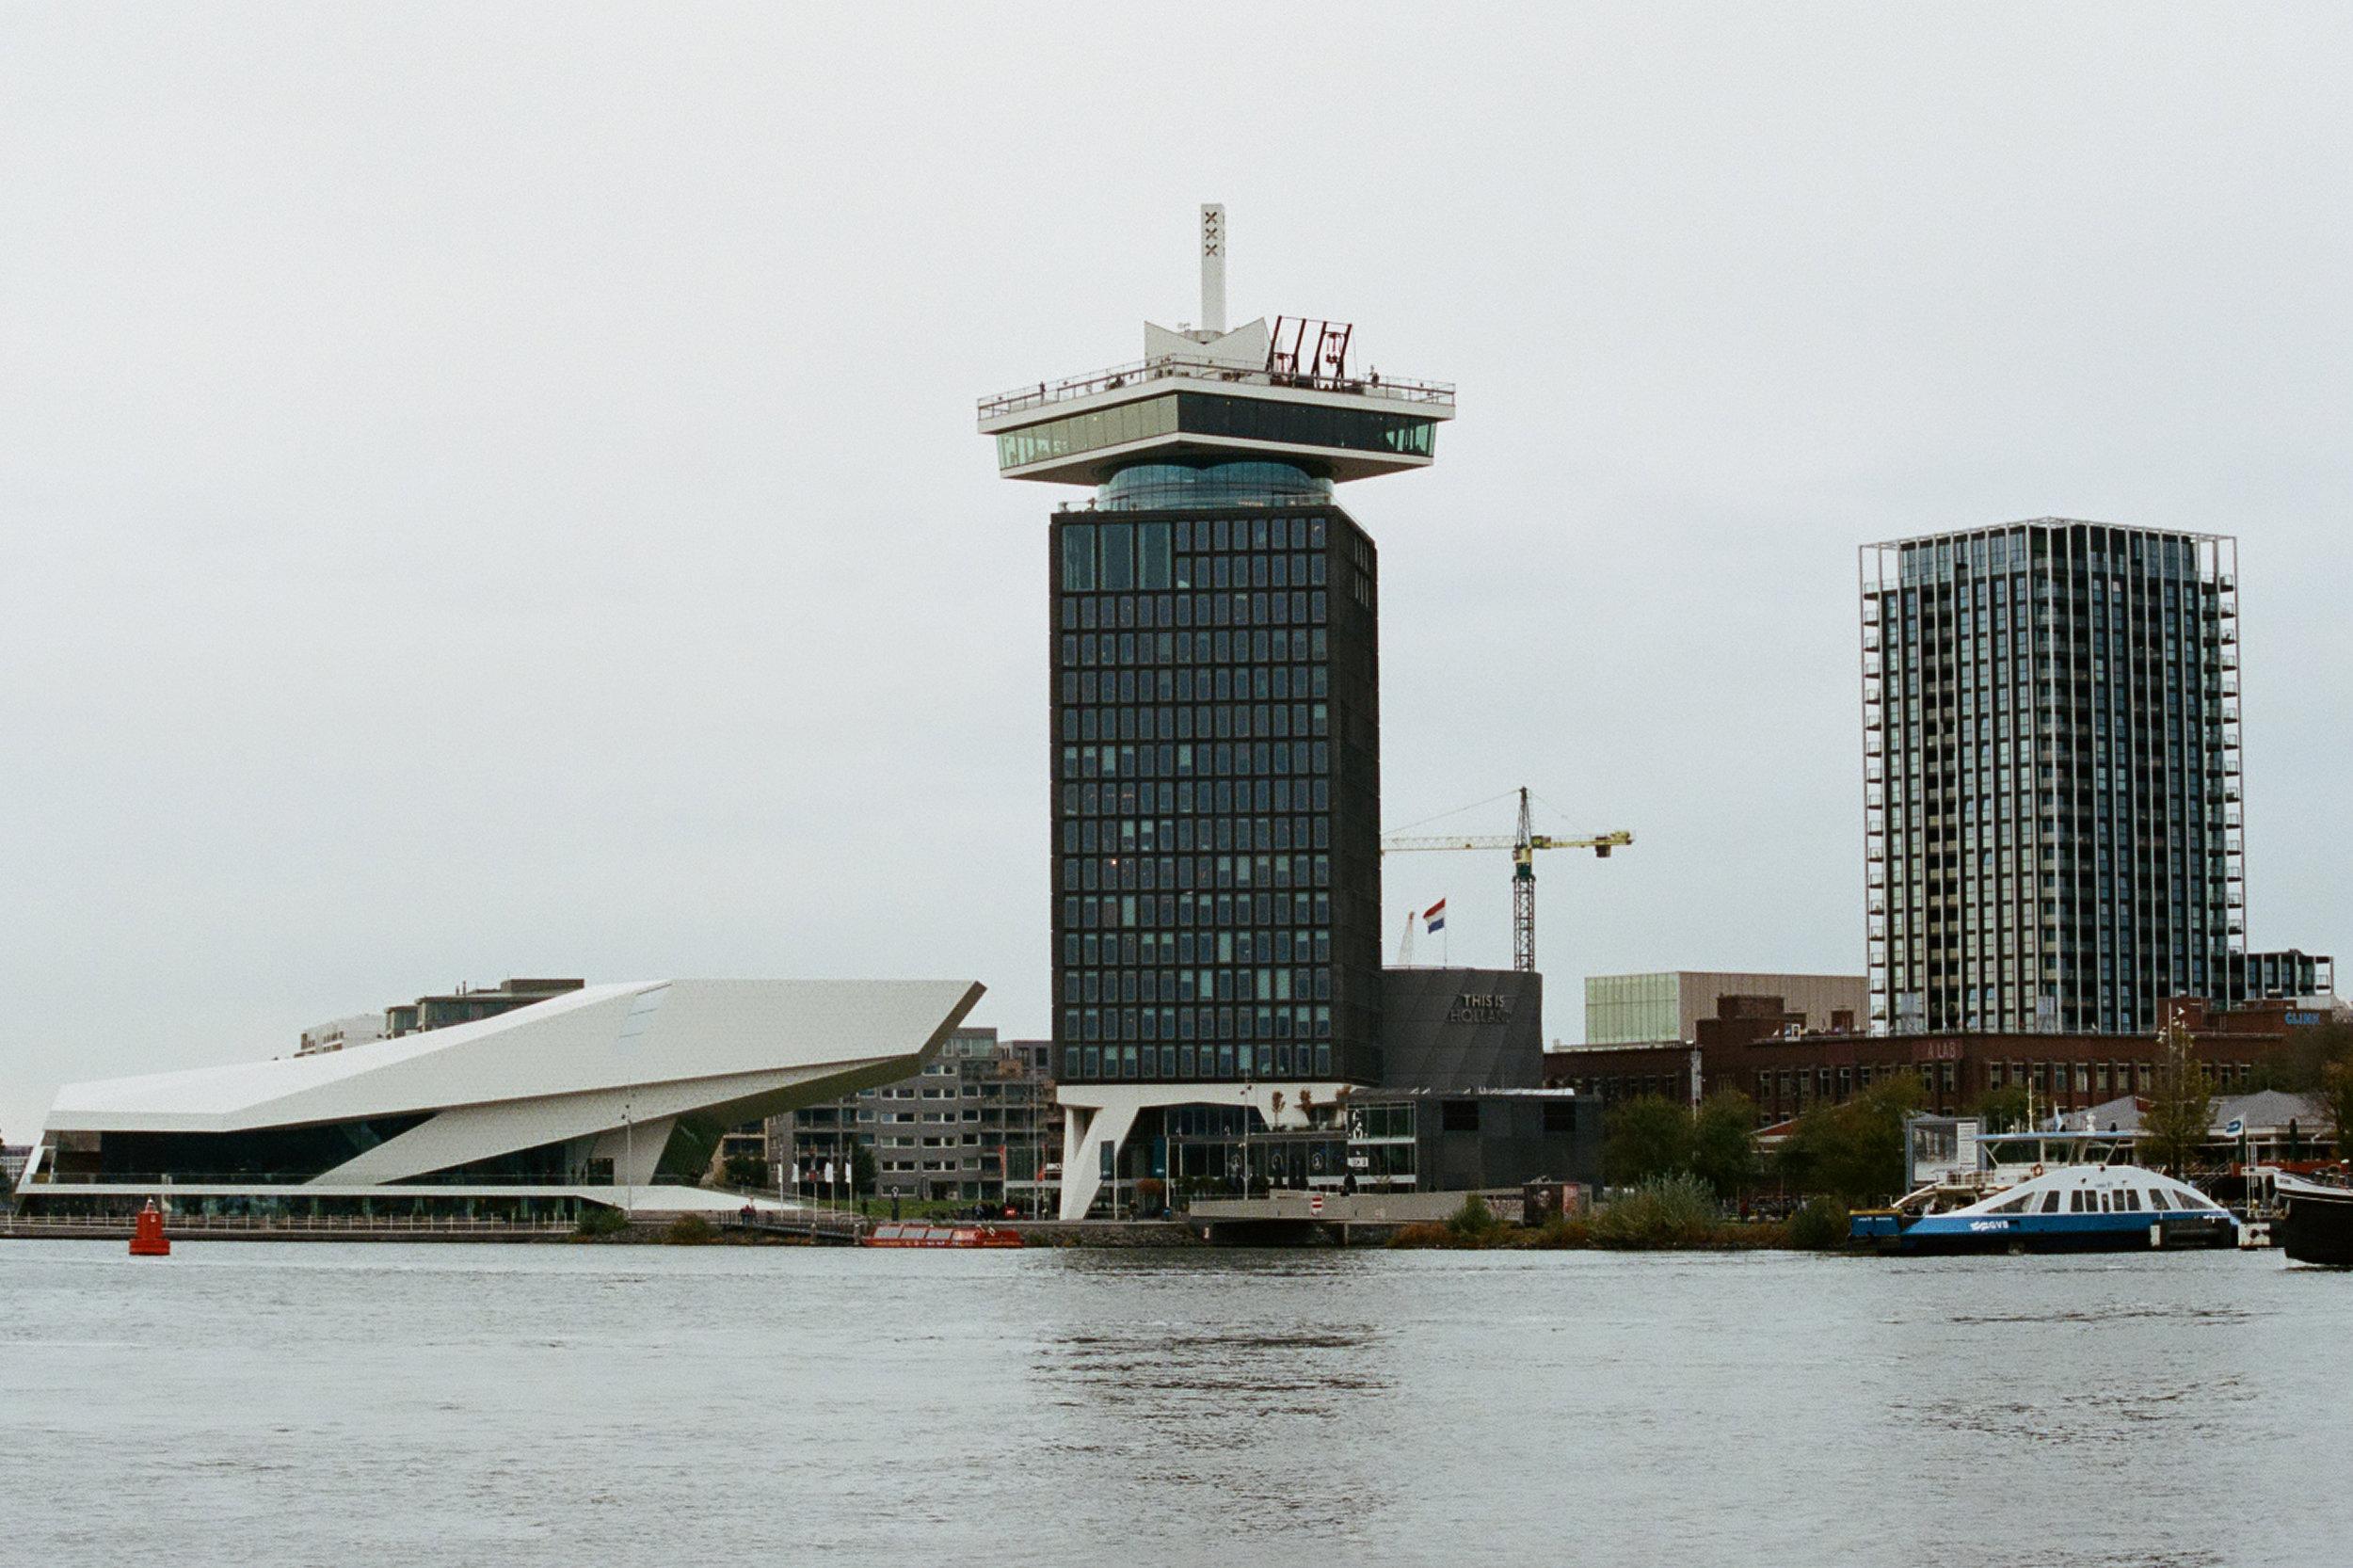 Amsterdam_0015 copy.jpg